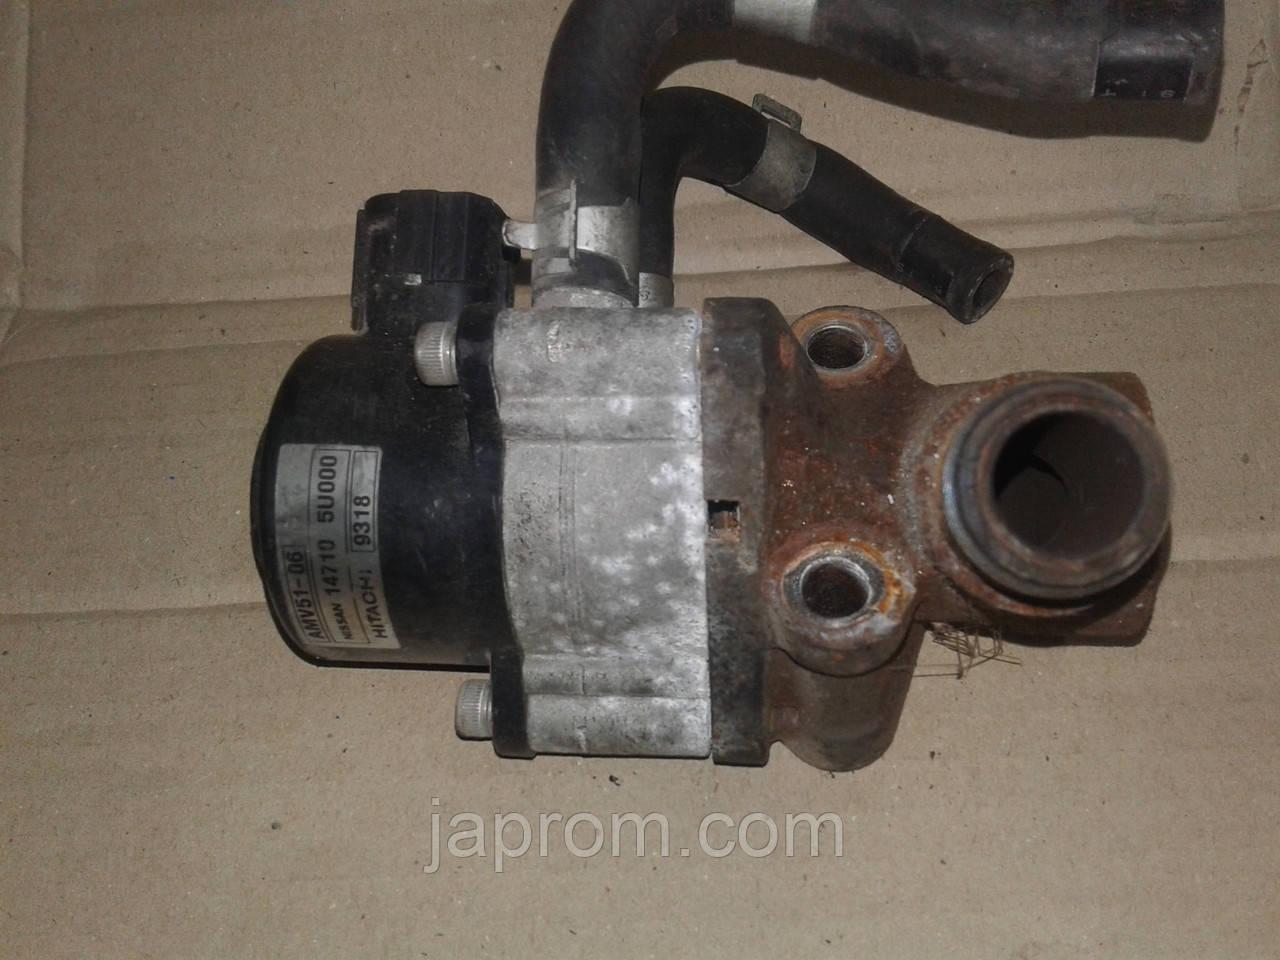 Клапан Egr Nissan Vanette Serena C24 1999-2001г.в. SR20DE 2.0 бензин